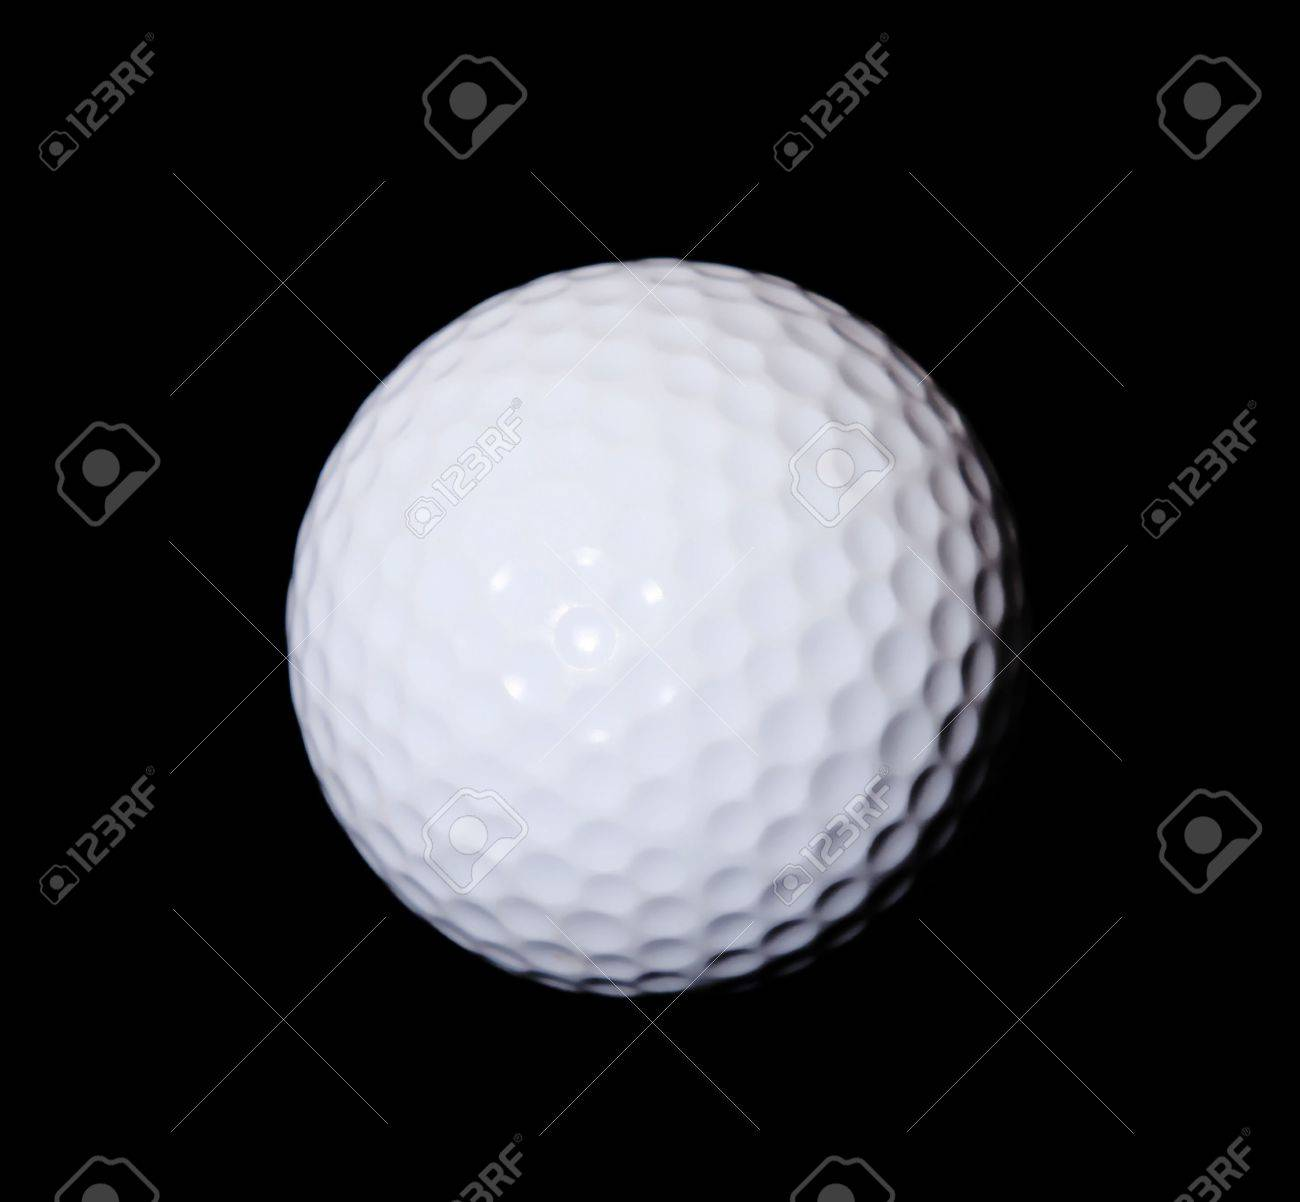 White golf ball over black background. Isolated image Stock Photo - 6069107